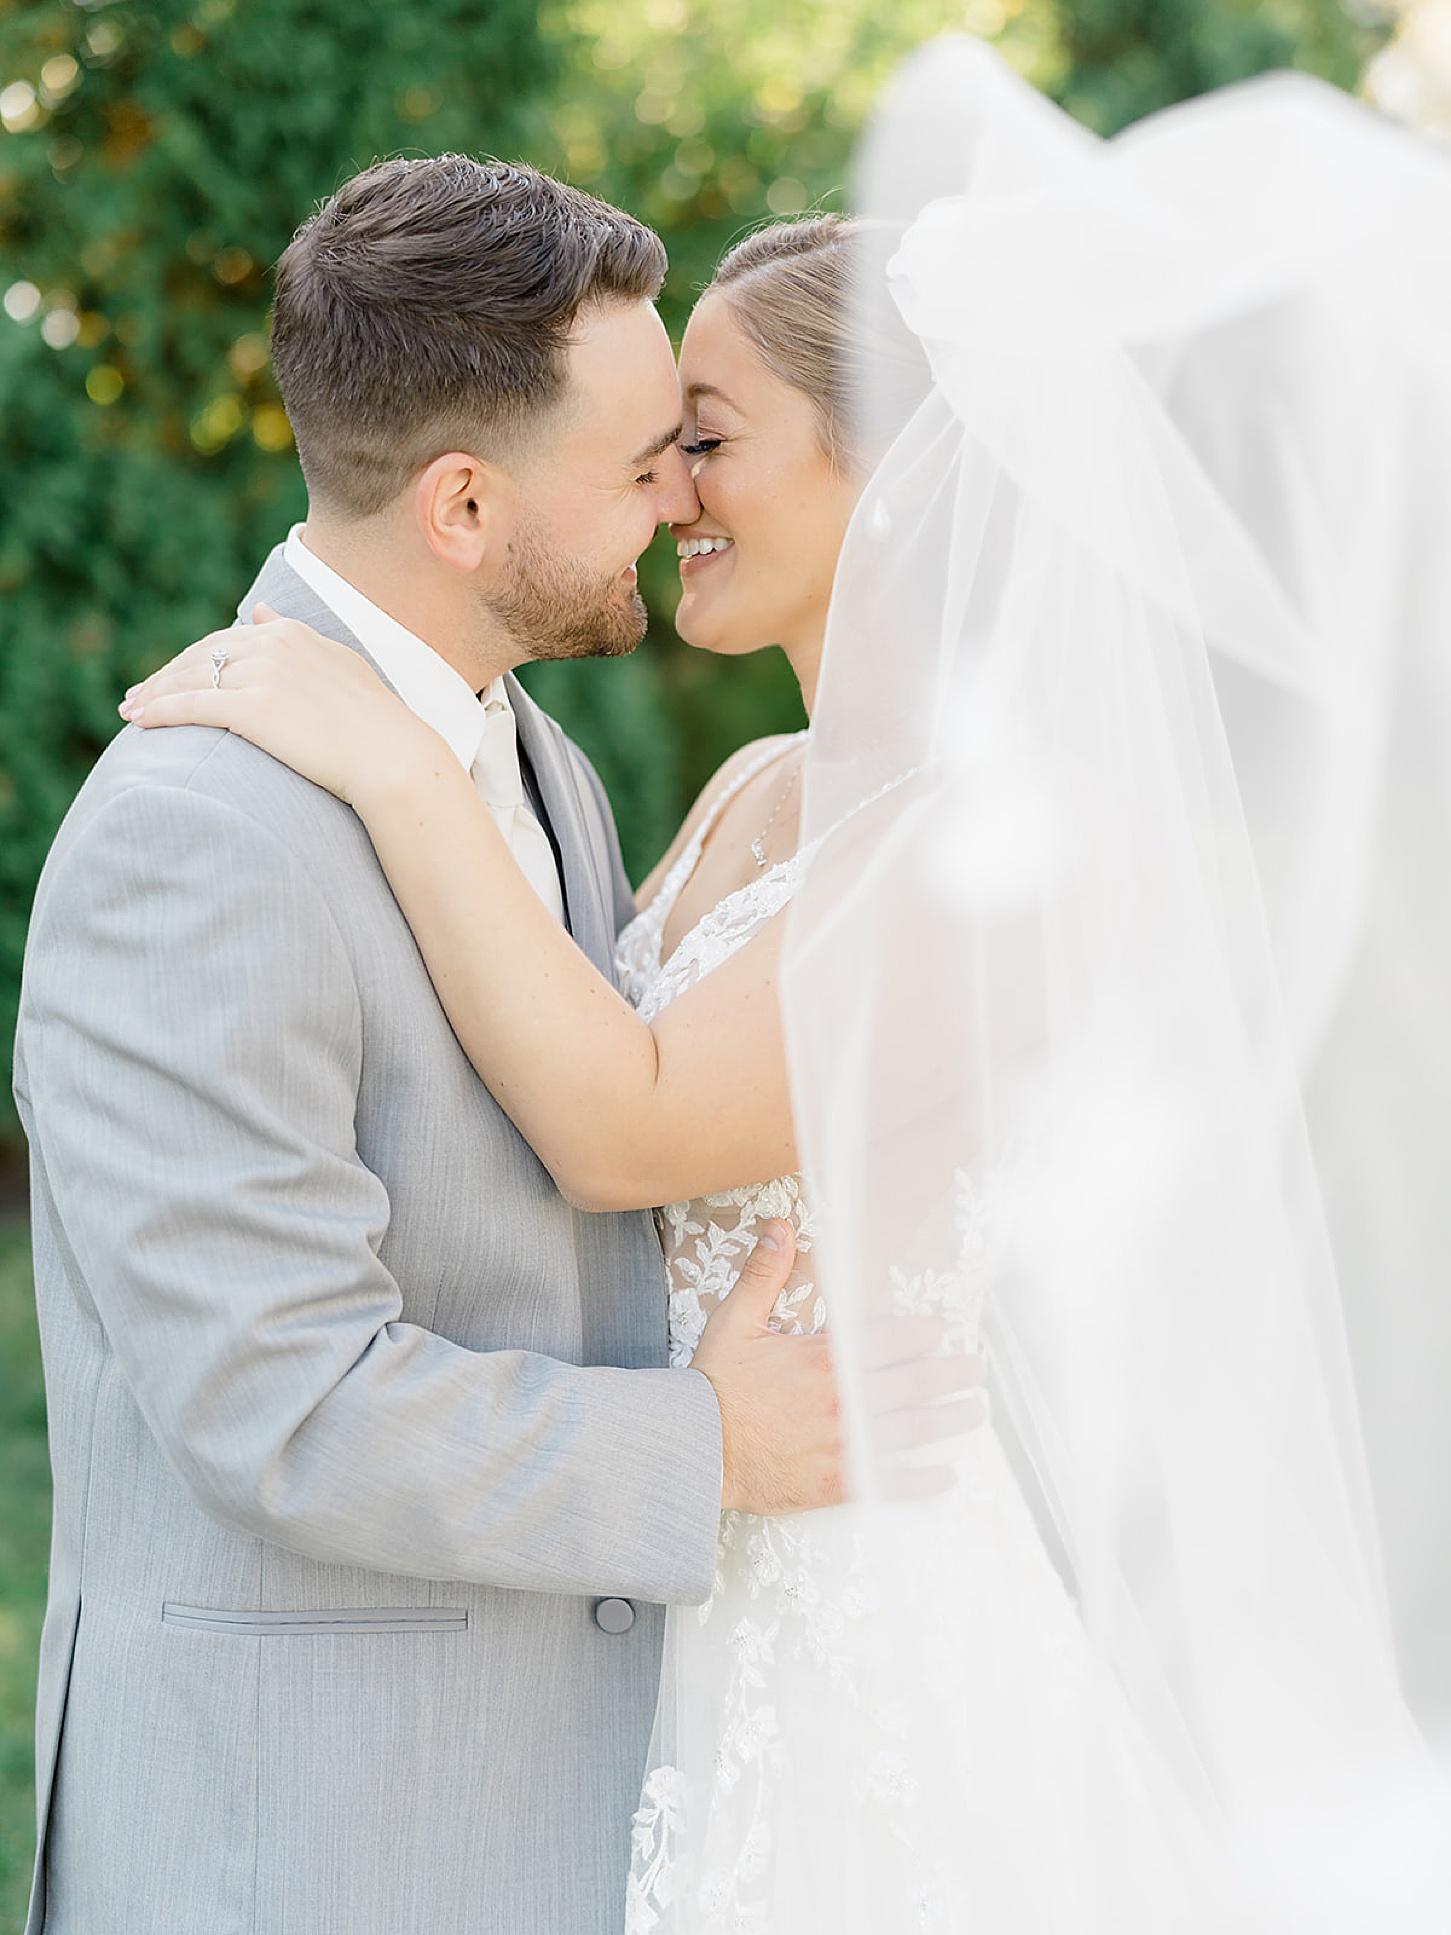 Valenzano Winery Vitners Pavillion Wedding Photography by Magdalena Studios 0011